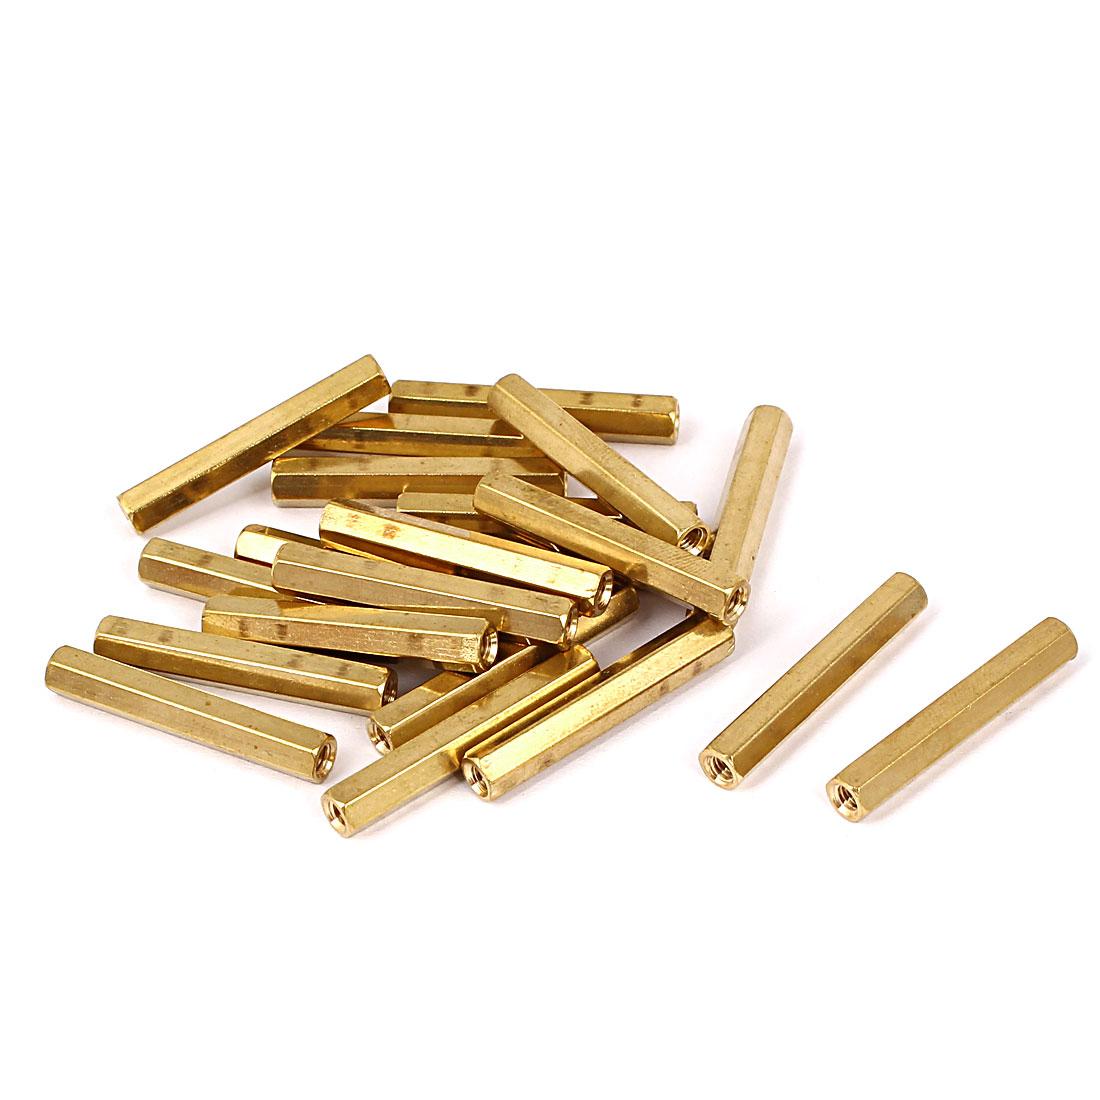 M3 x 27mm Female/Female Thread Brass Hex Standoff PCB Pillar Spacer 20 Pcs